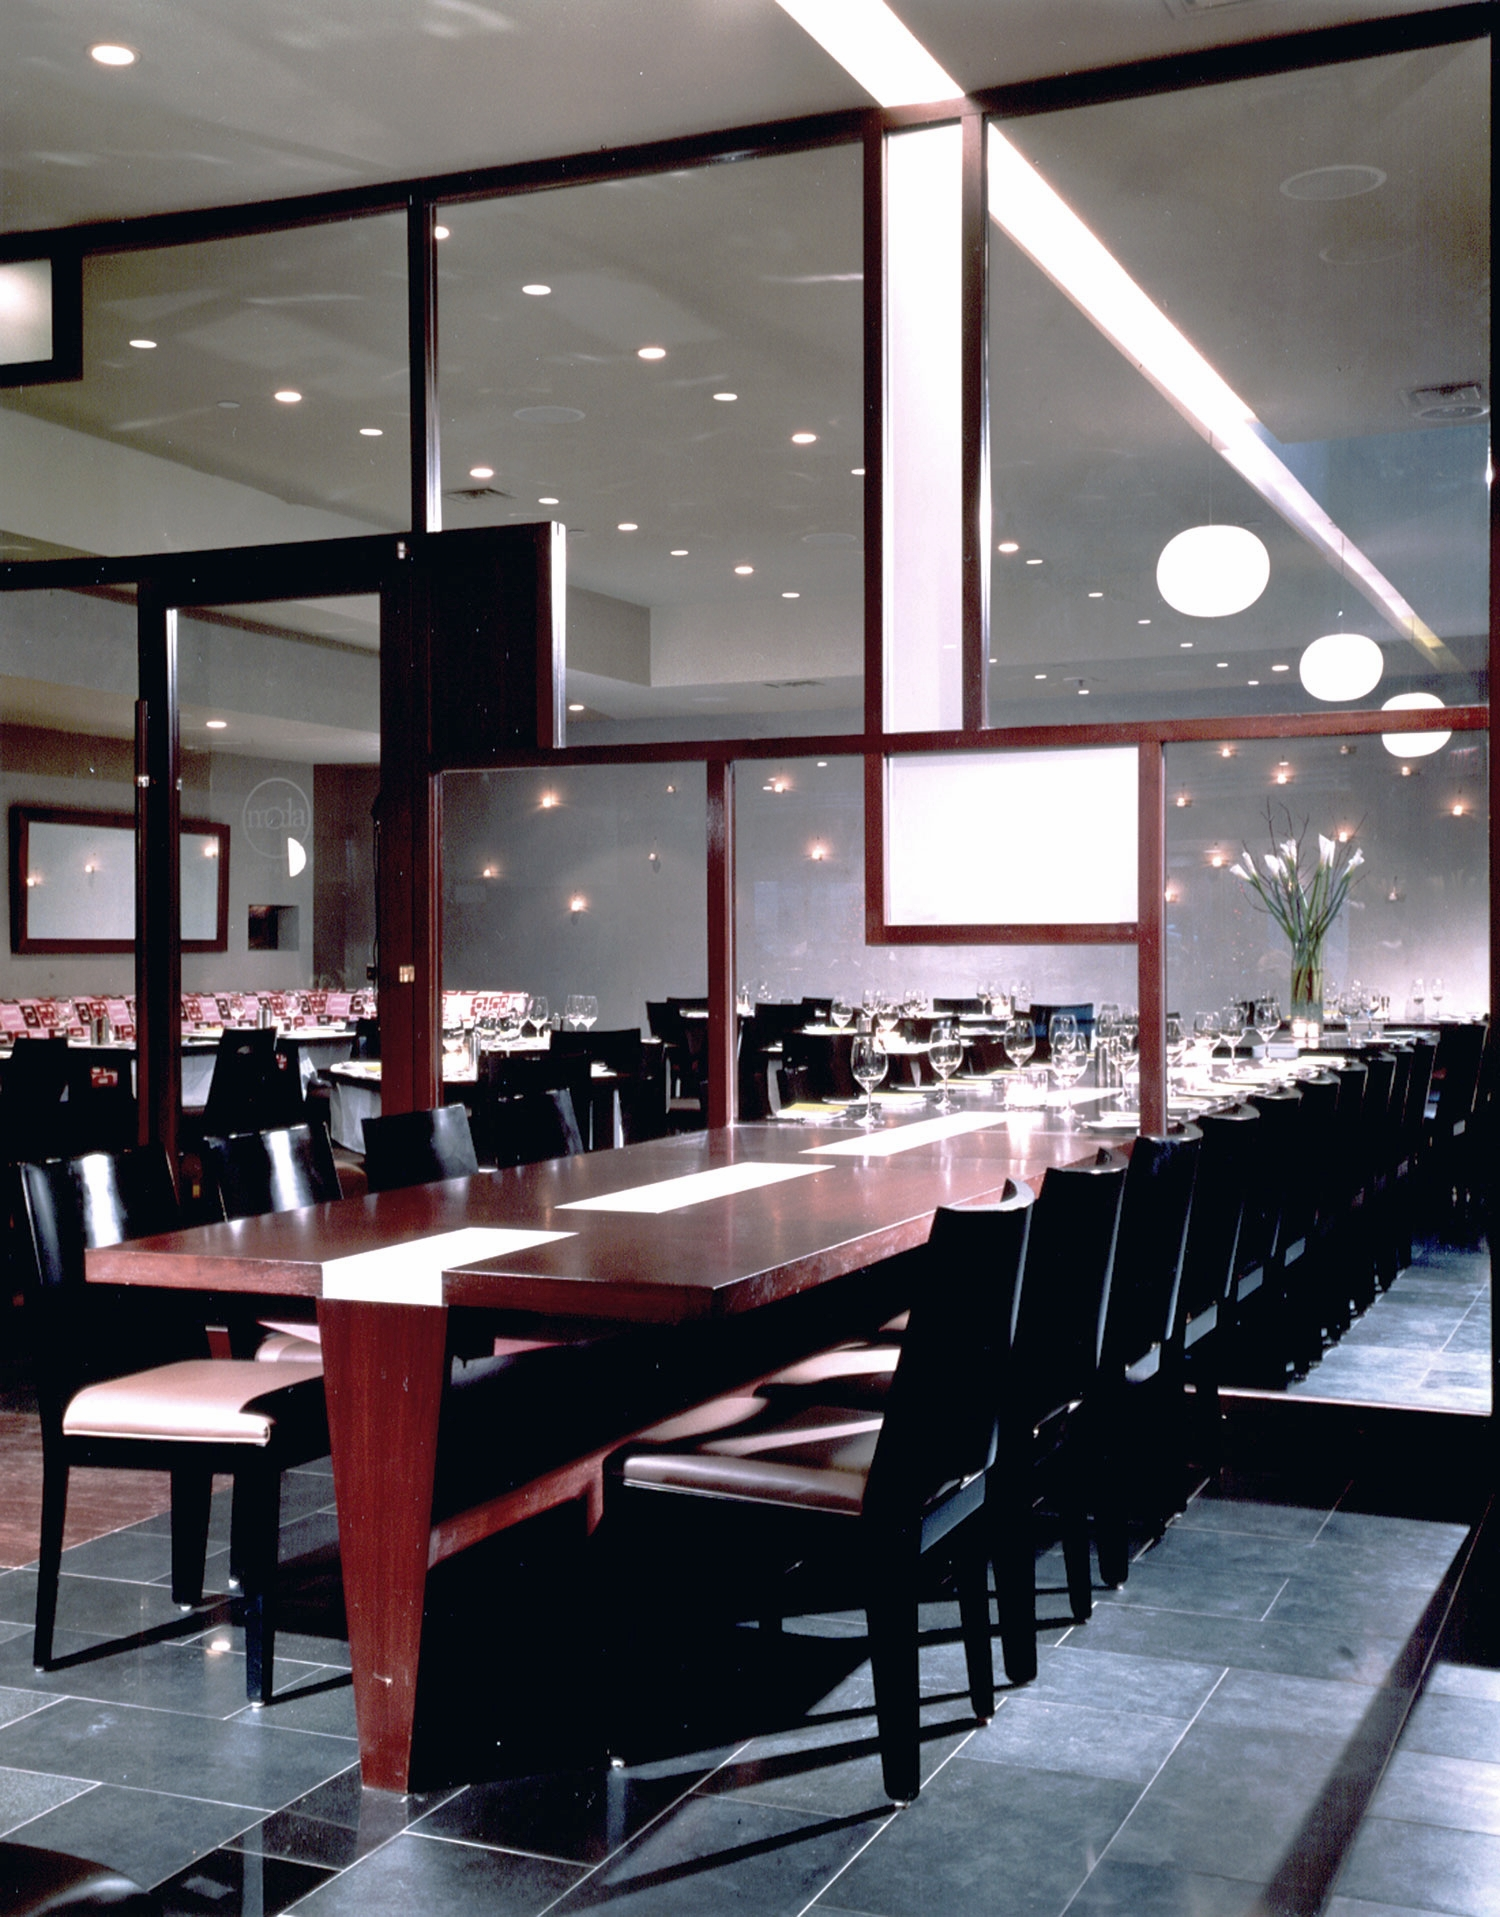 Moda Restaurant at Flatotel